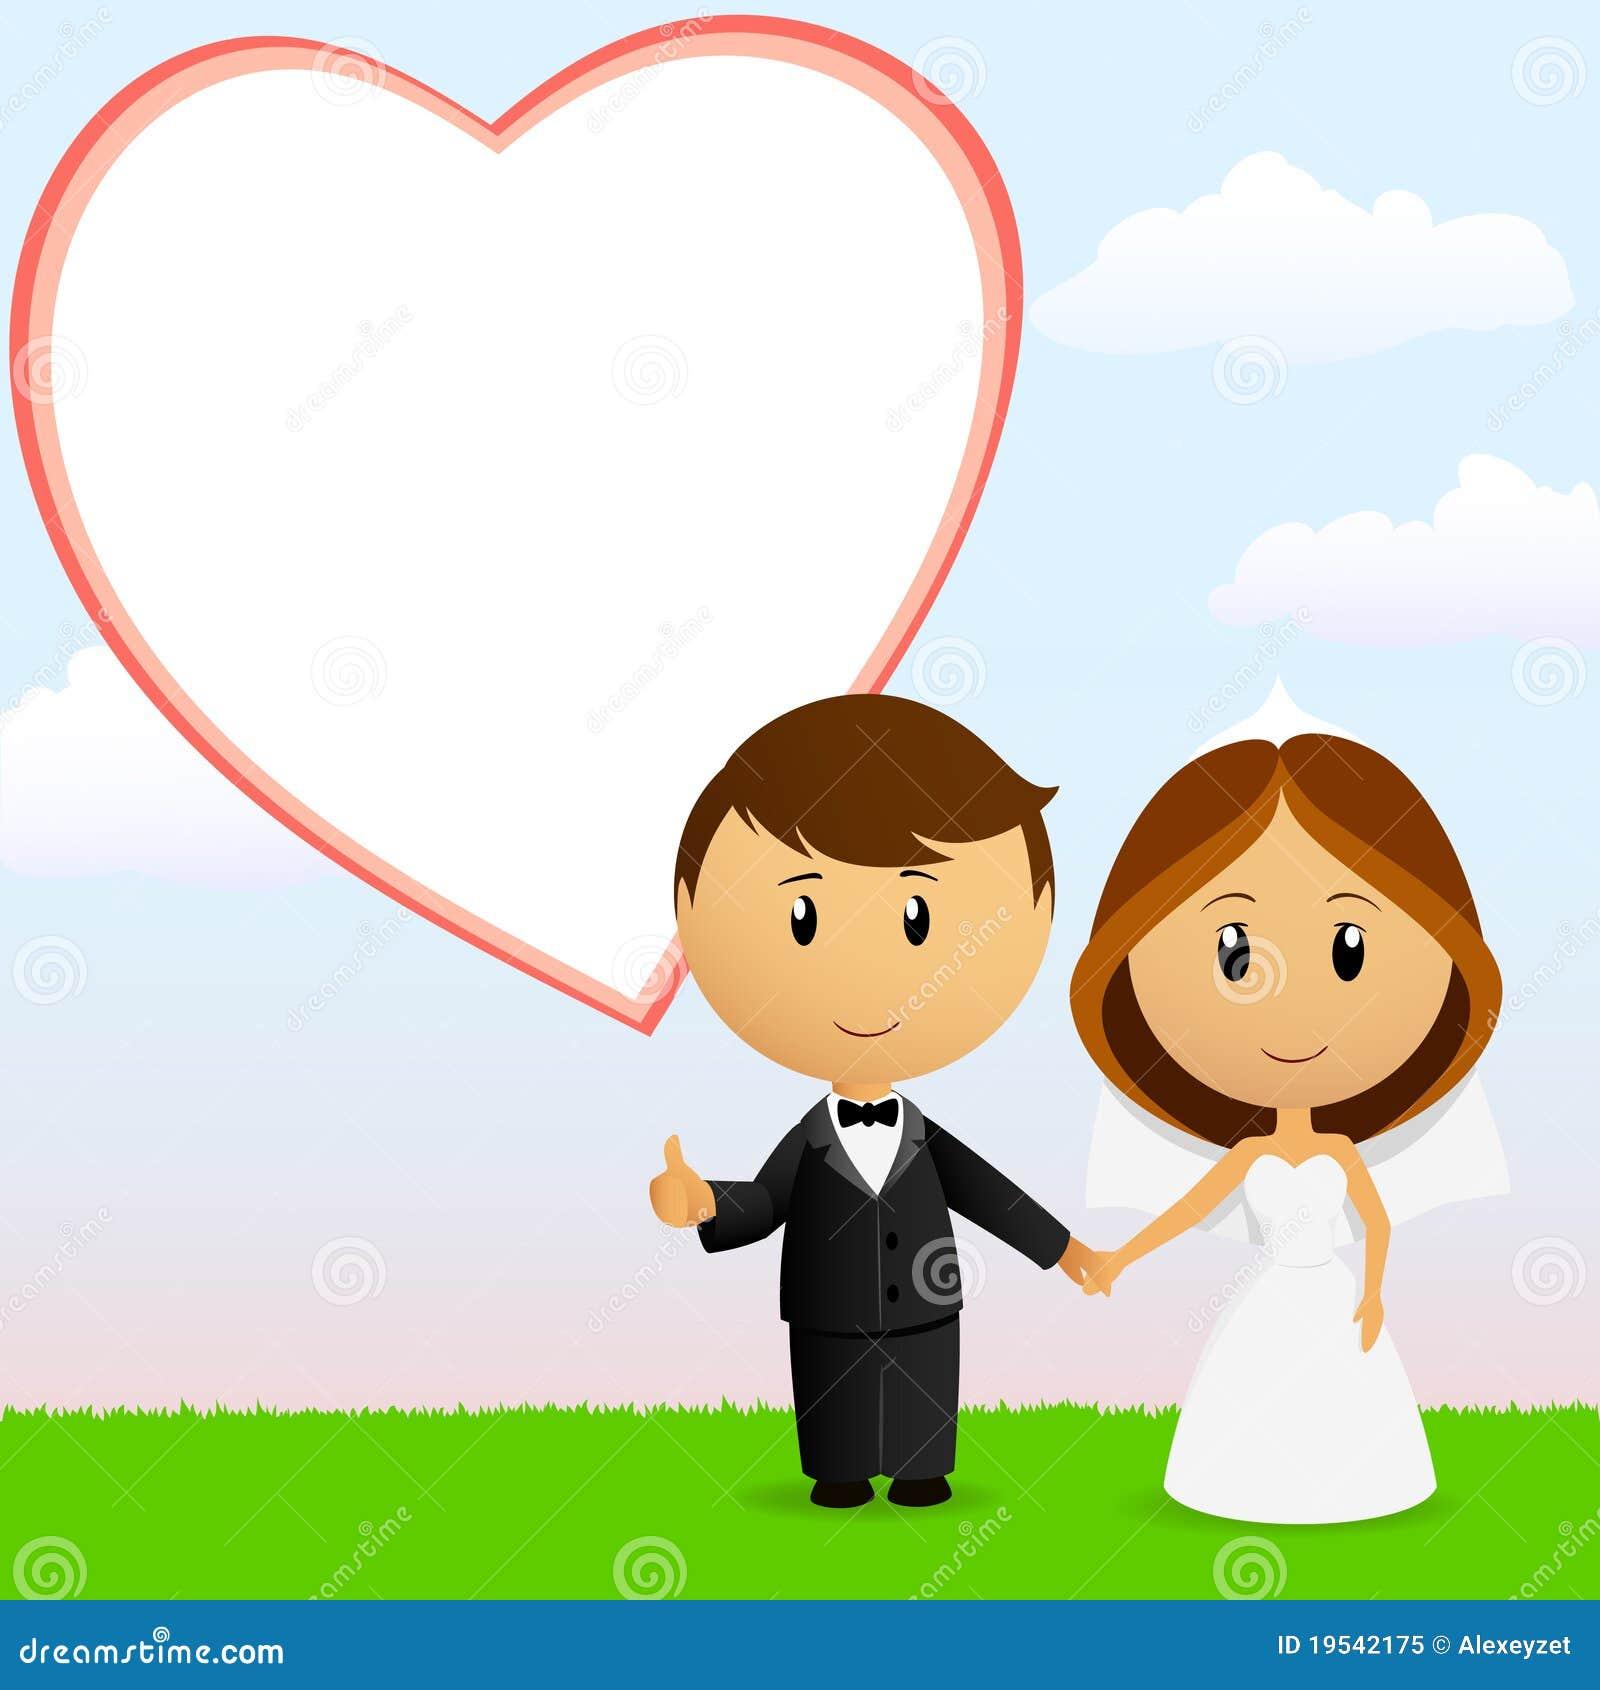 Cartoon Wedding Cute Couple Stock Illustrations 13 698 Cartoon Wedding Cute Couple Stock Illustrations Vectors Clipart Dreamstime